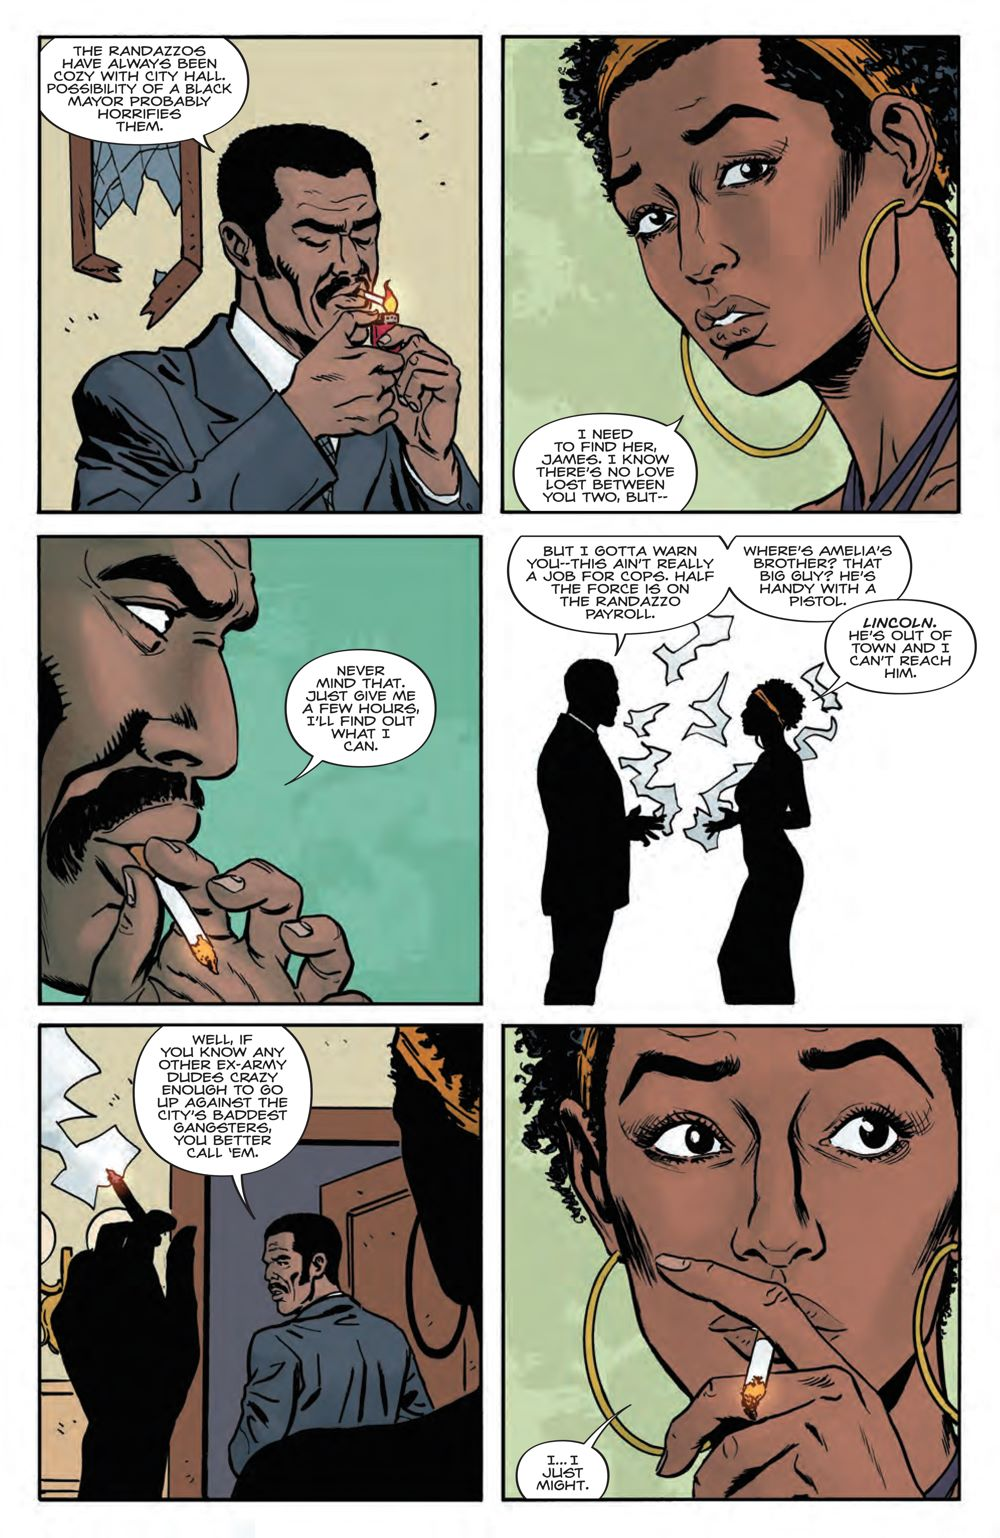 Abbott_1973_003_PRESS_6 ComicList Previews: ABBOTT 1973 #3 (OF 5)